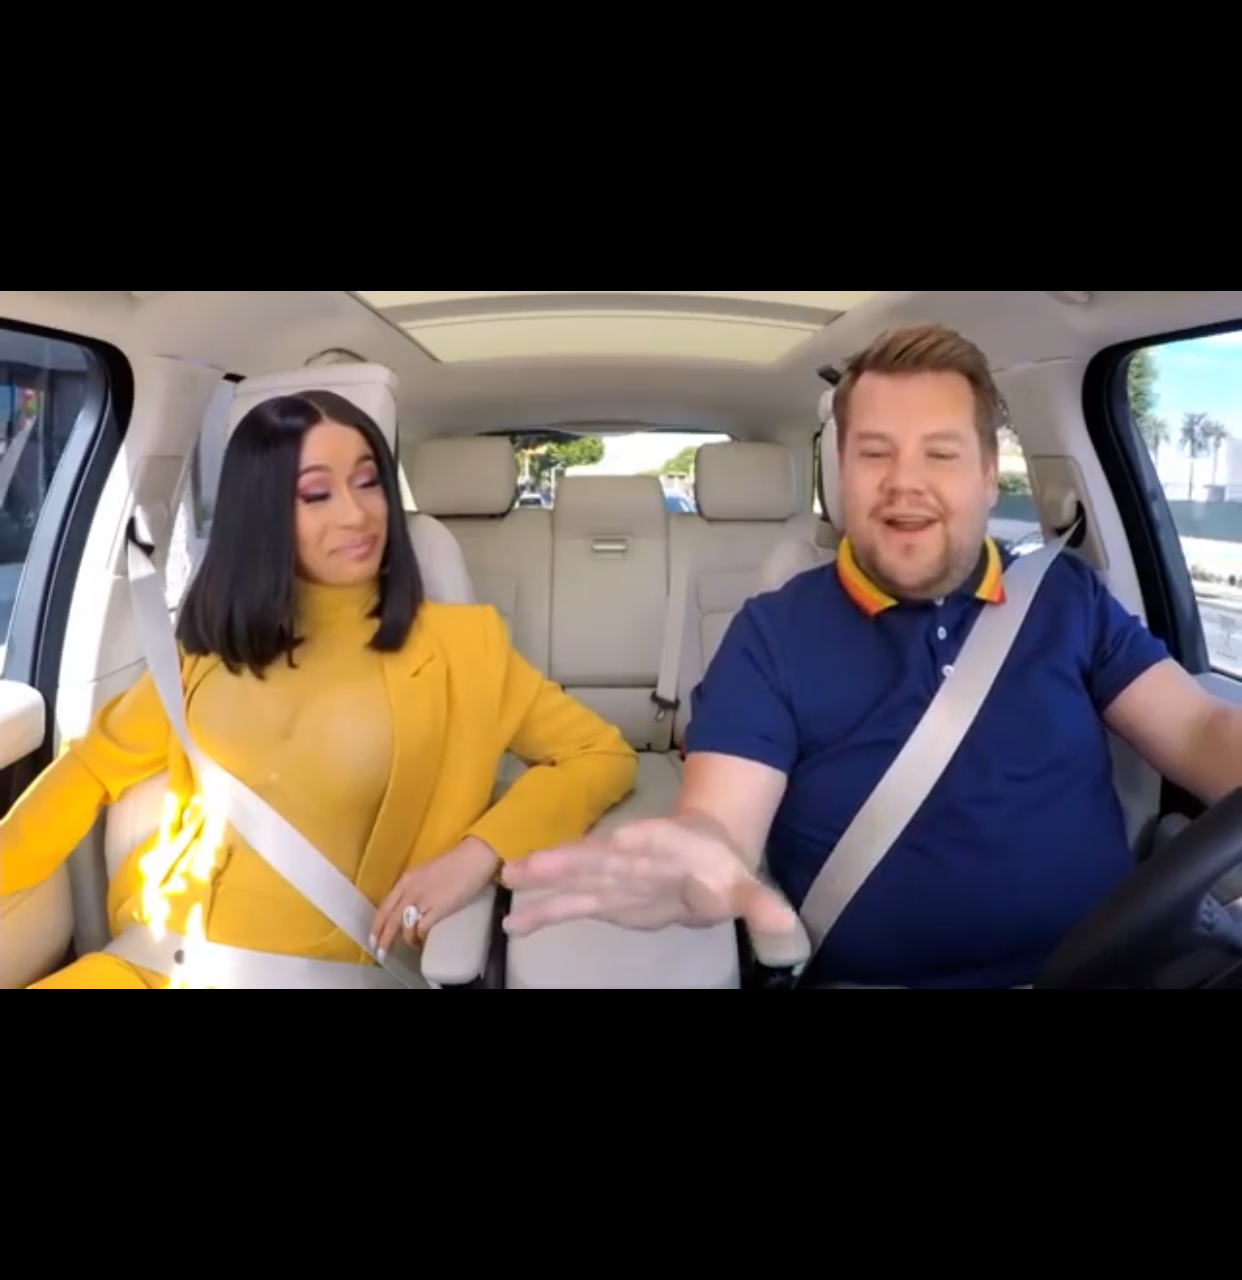 Cardi B Goes Carpooling With James Corden 8403 Media Videos